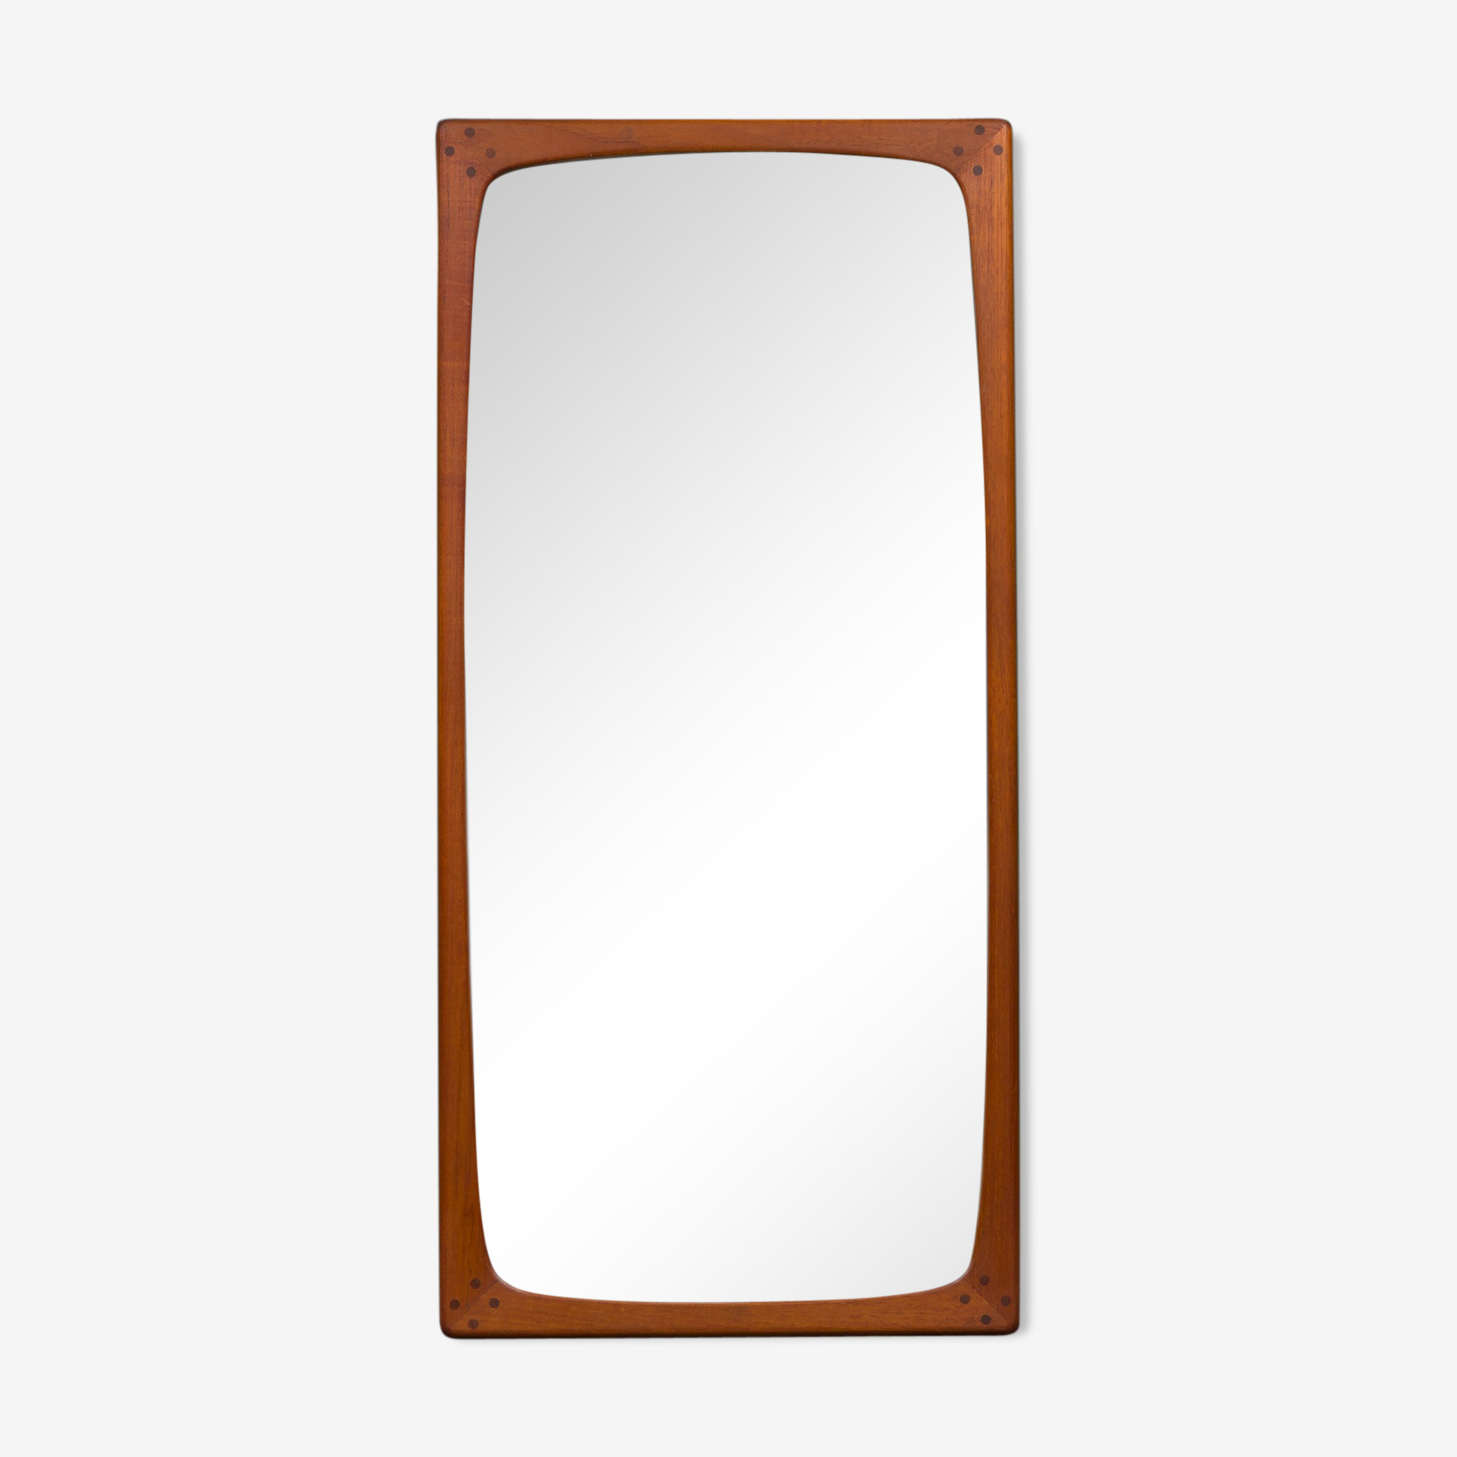 Miroir en teck de danois 47x100cm